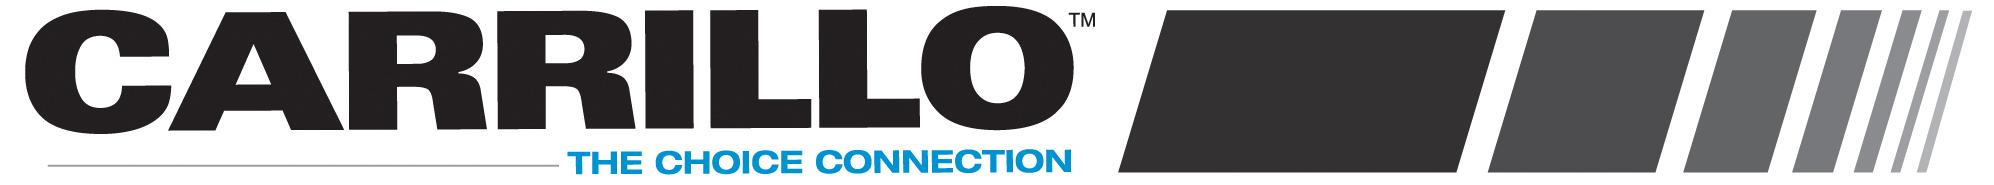 Carrillo-logo-Single.jpg